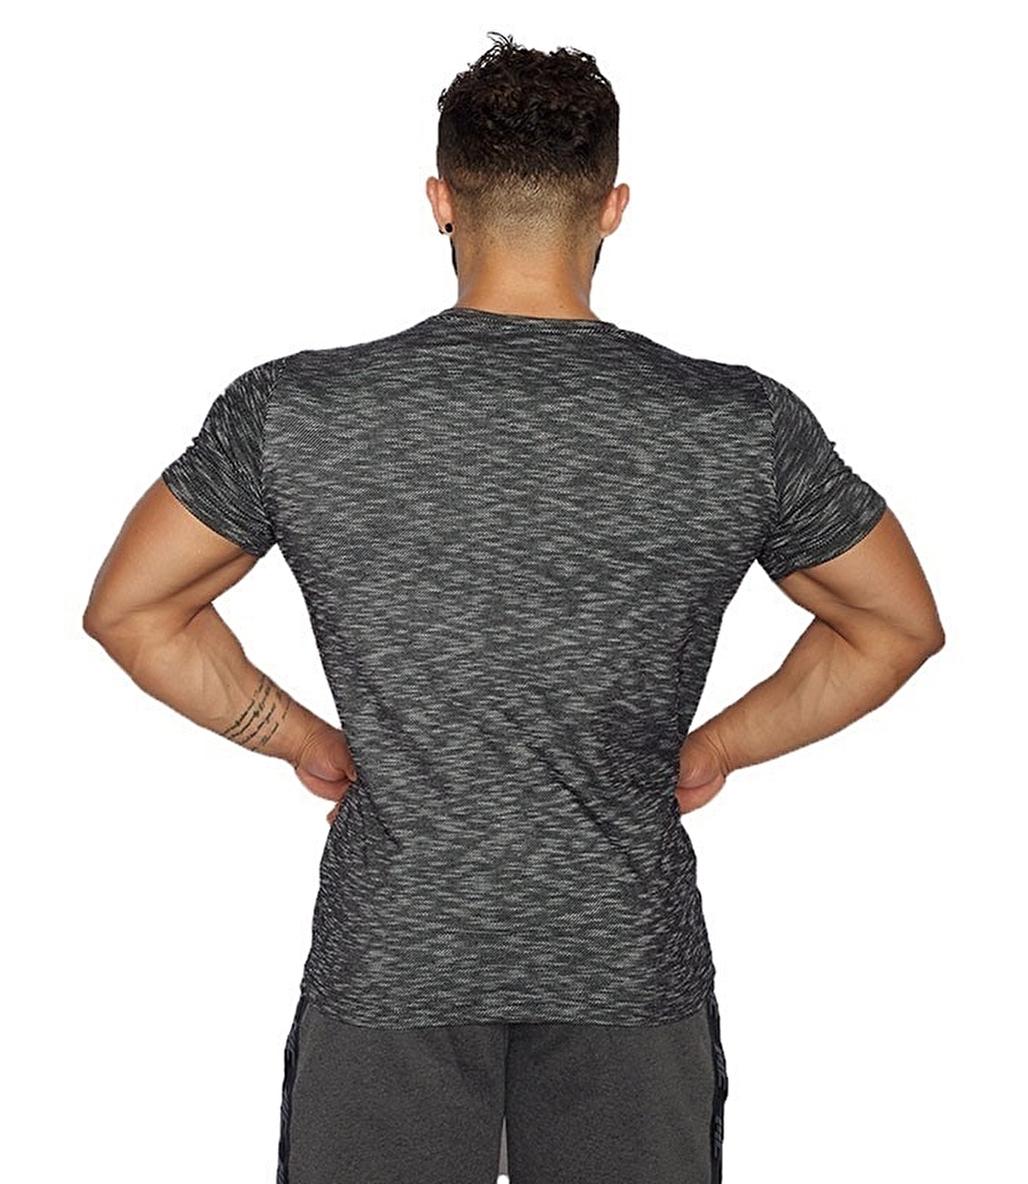 MuscleCloth Pro T-Shirt Siyah